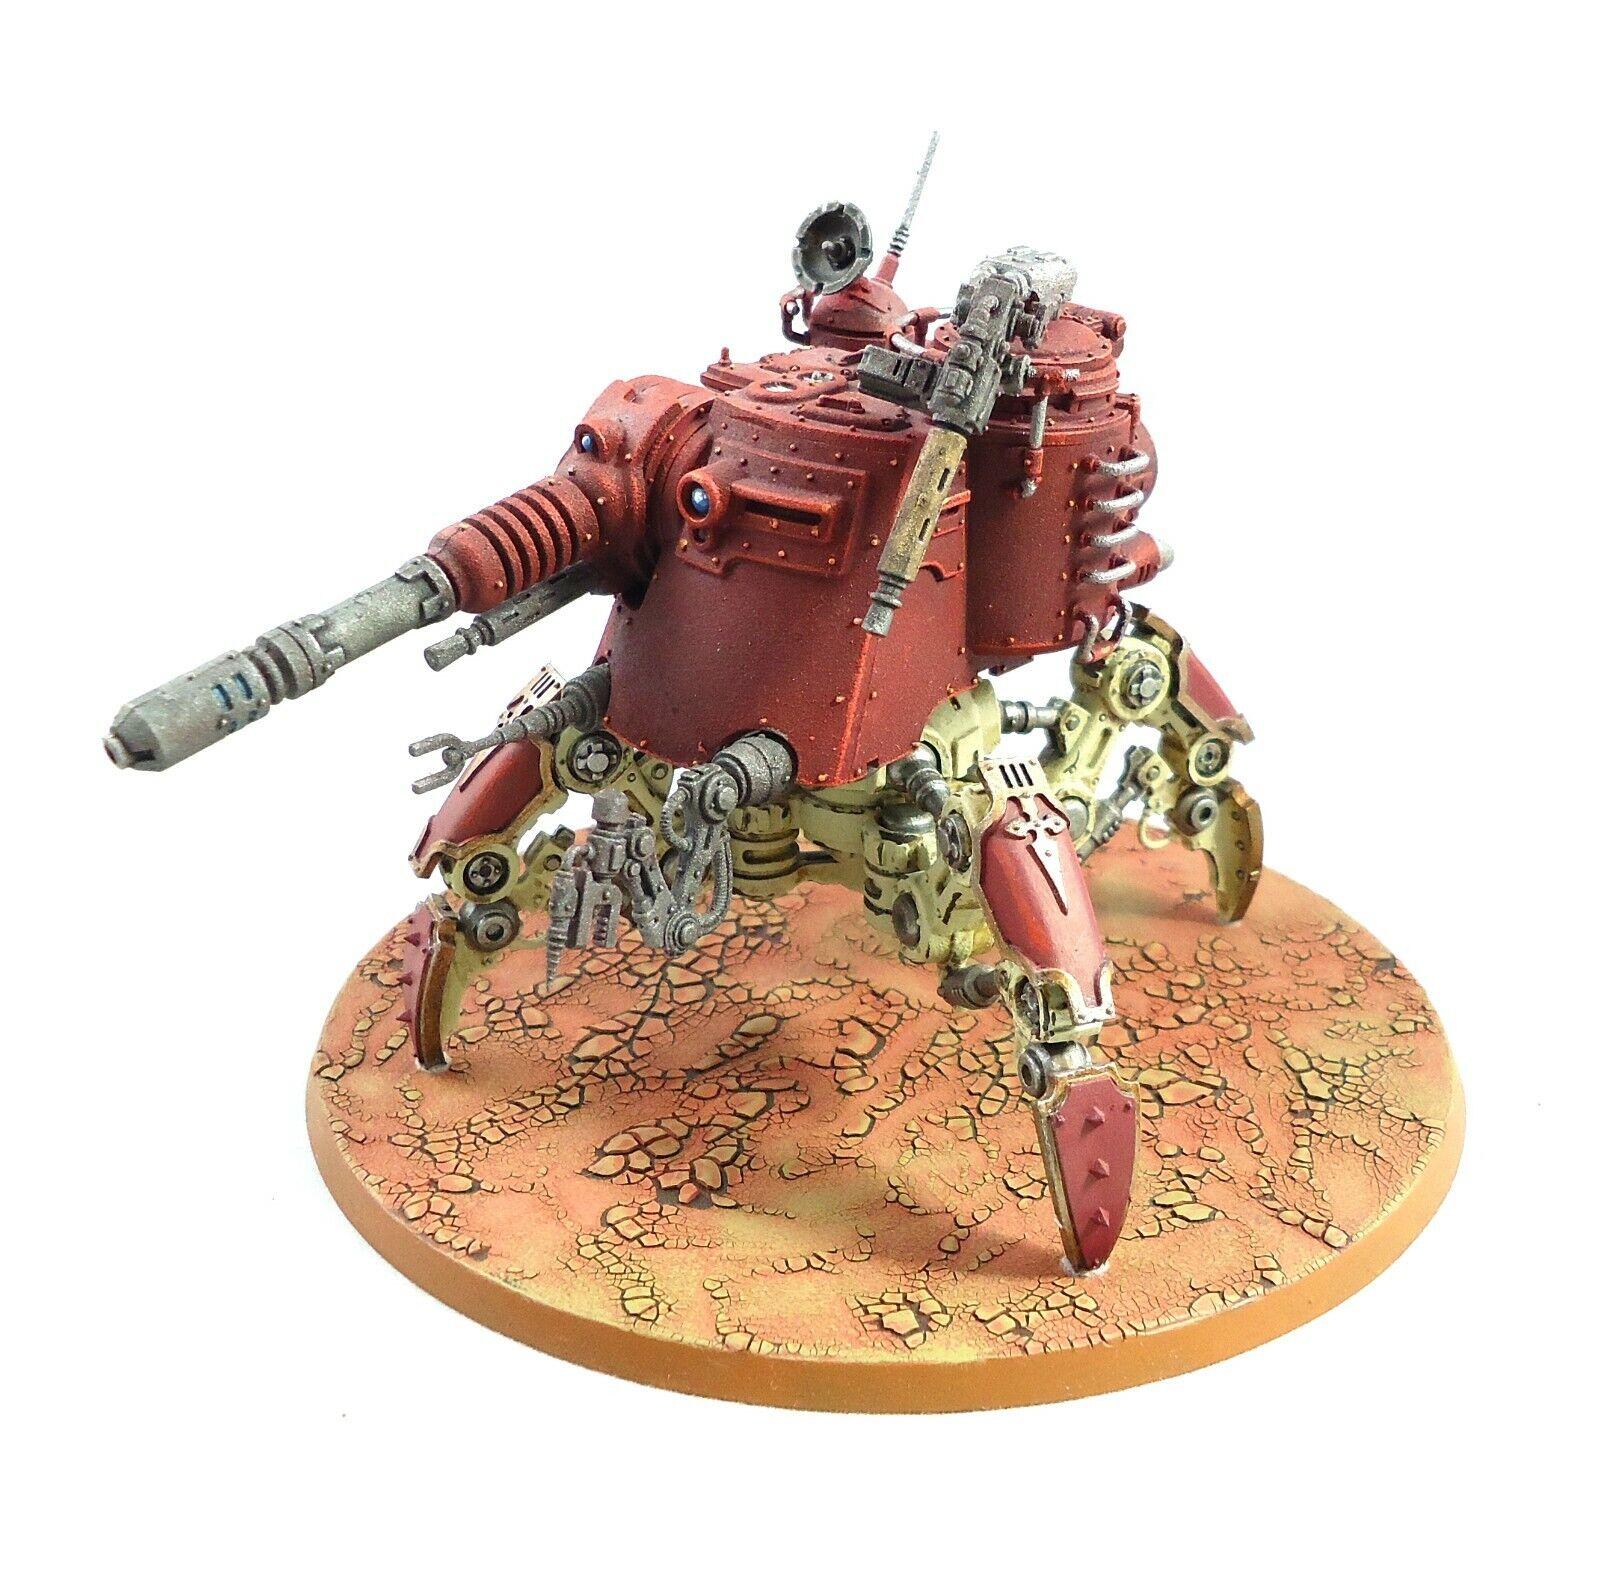 Warhammer 40k Armée Adeptus Mechanicus DUNECRAWLER PAINTED AND BASED